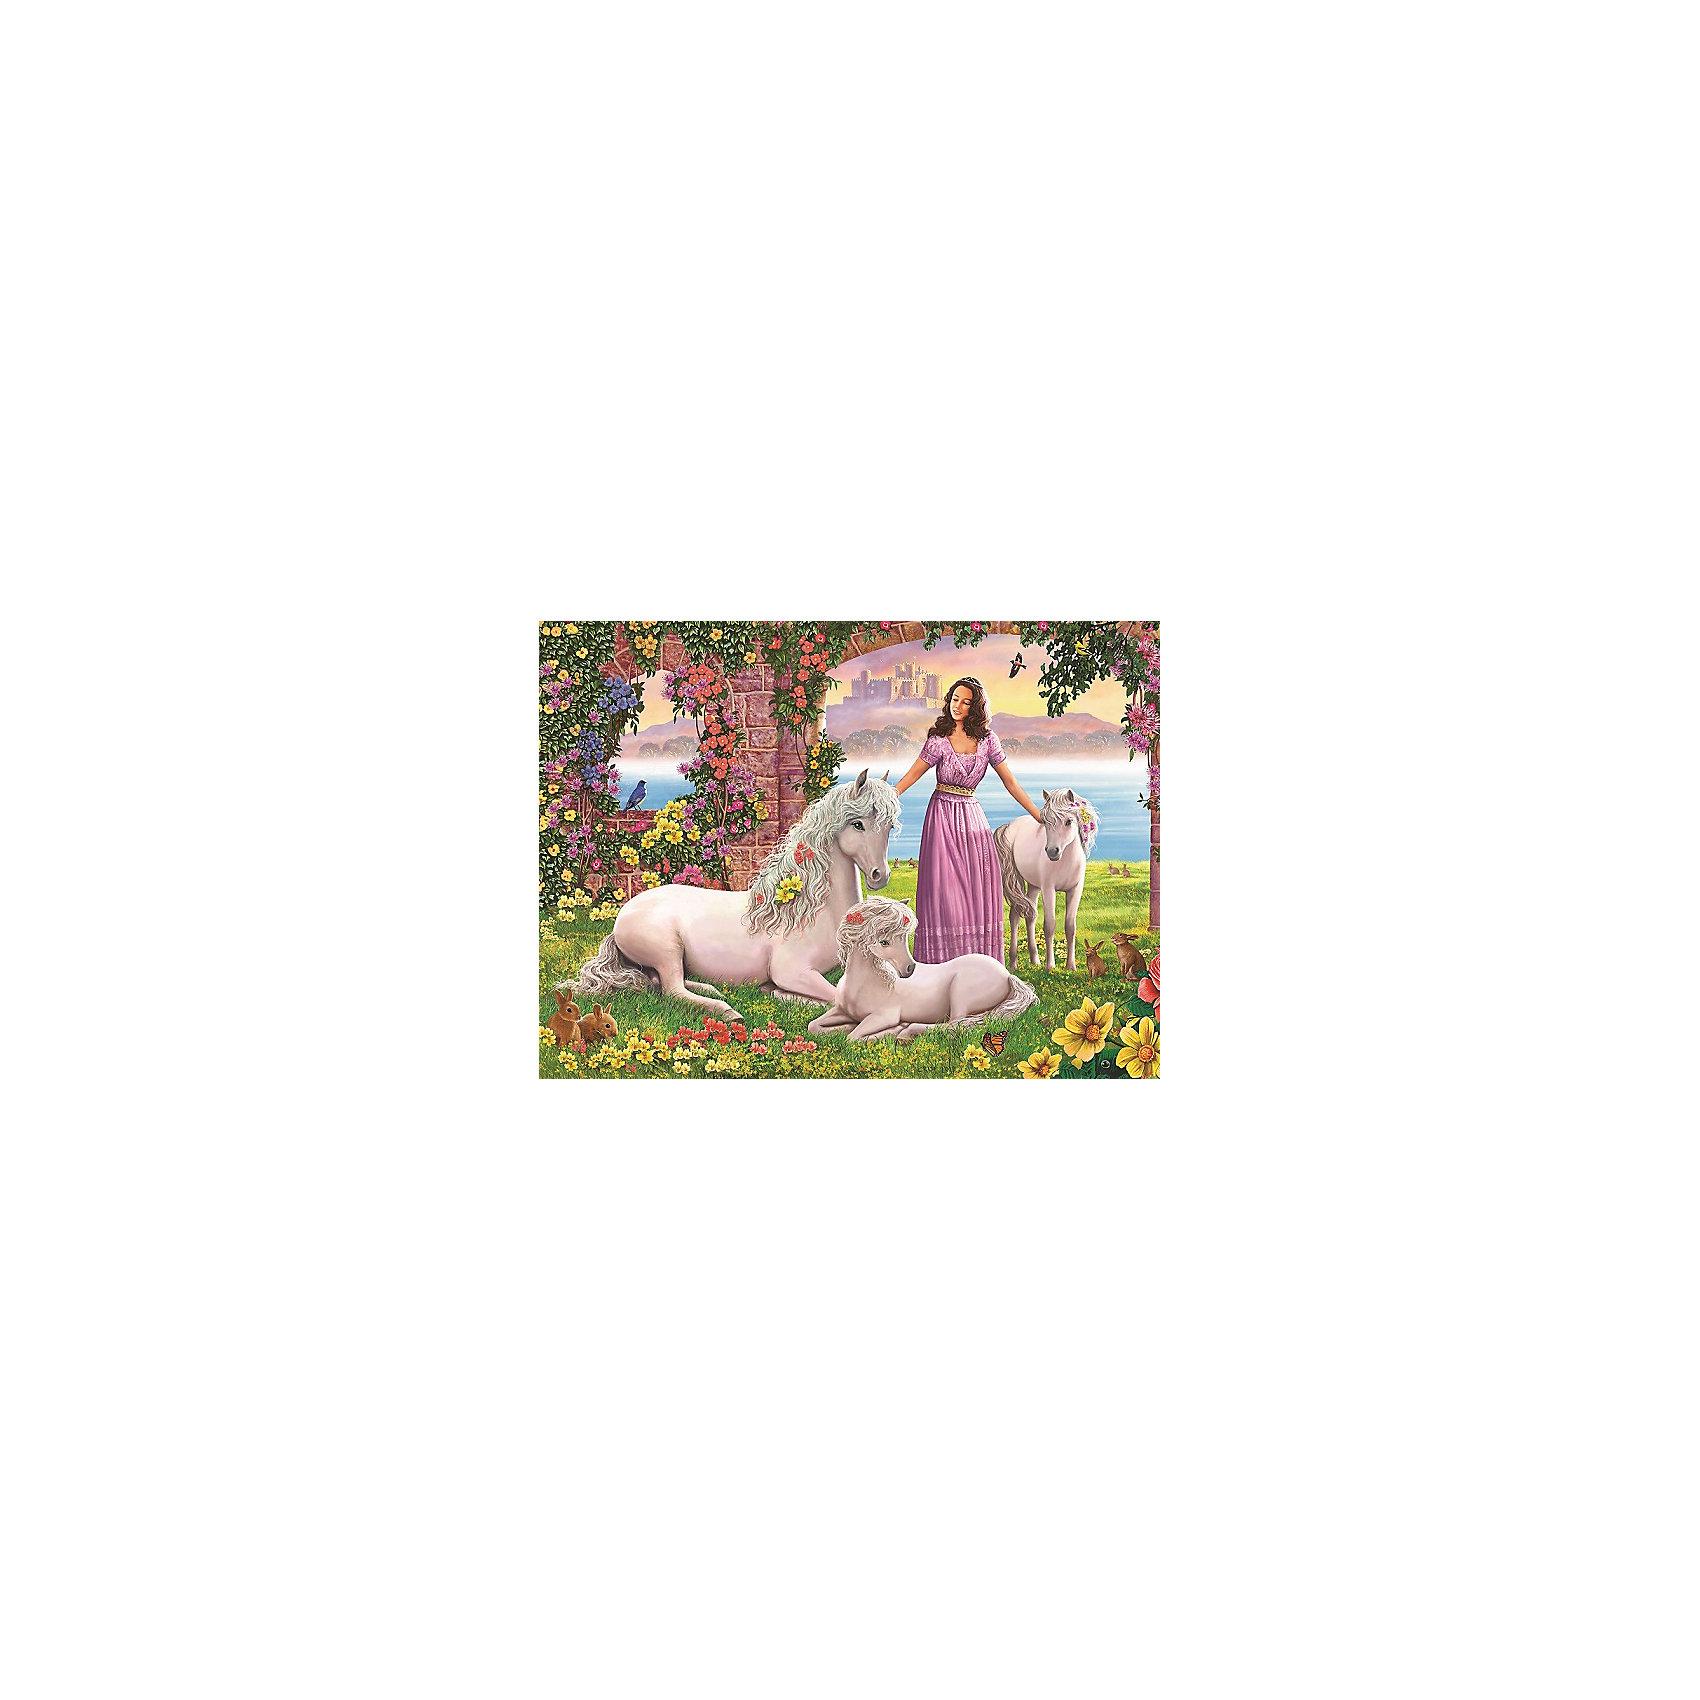 Пазл «Сказочное королевство» XXL150 шт от myToys